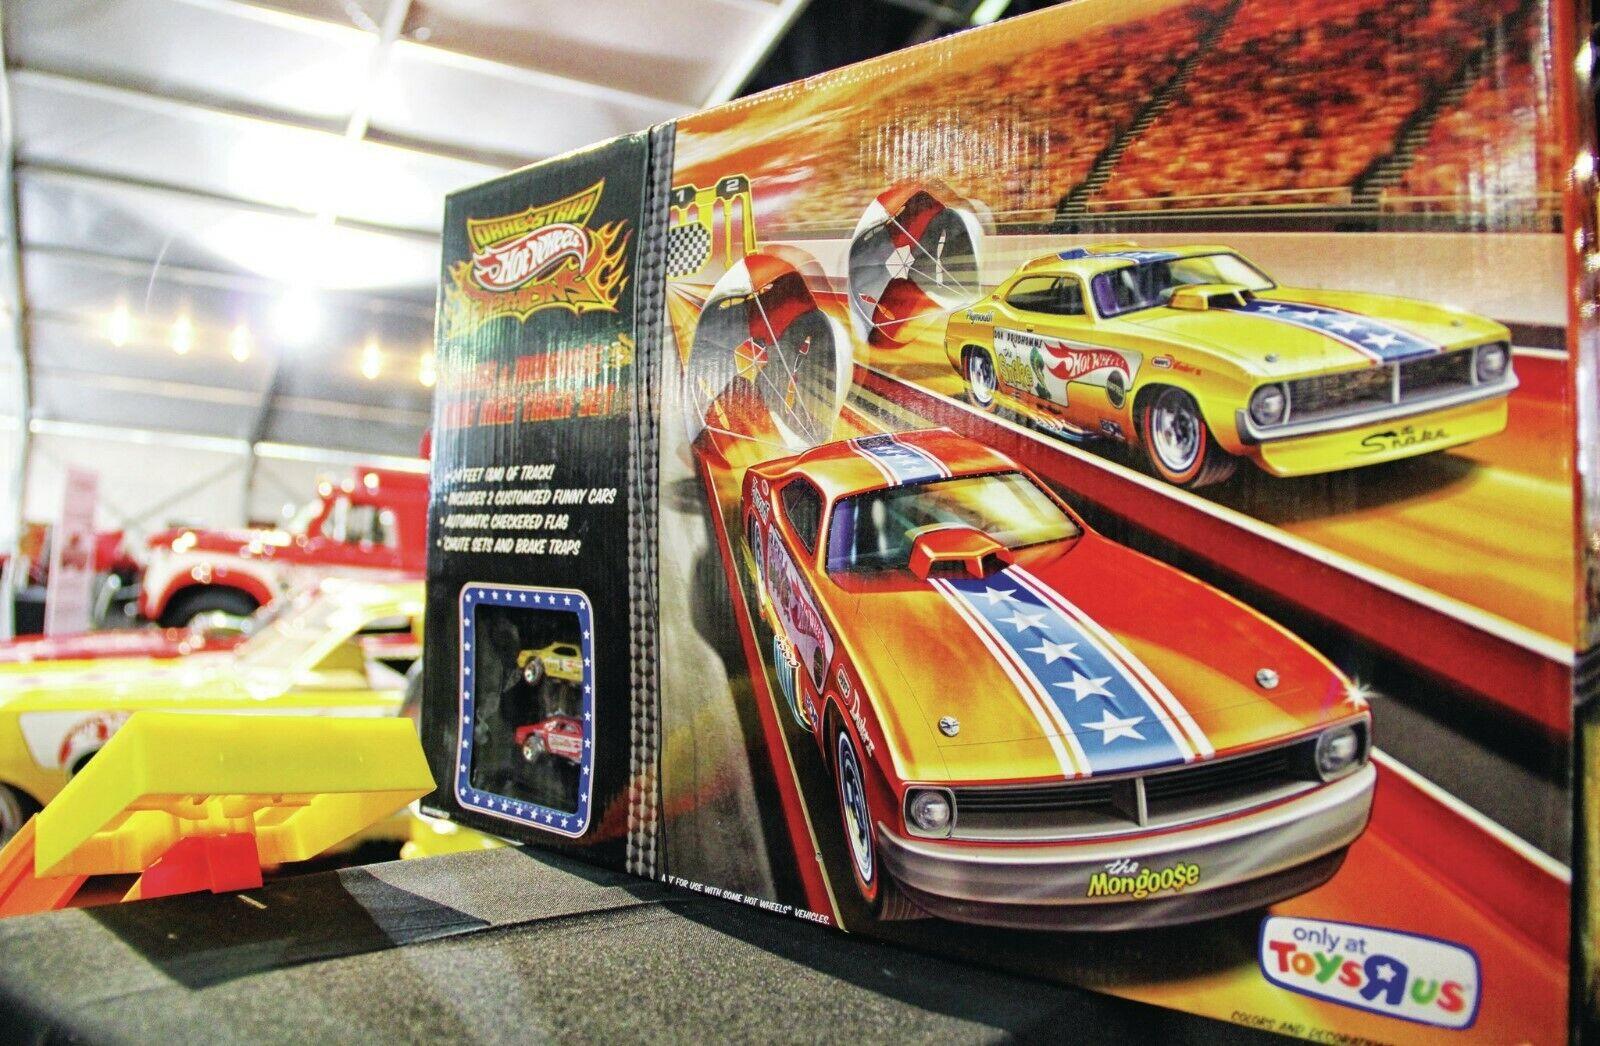 Hot Wheels Drag Race Track Set